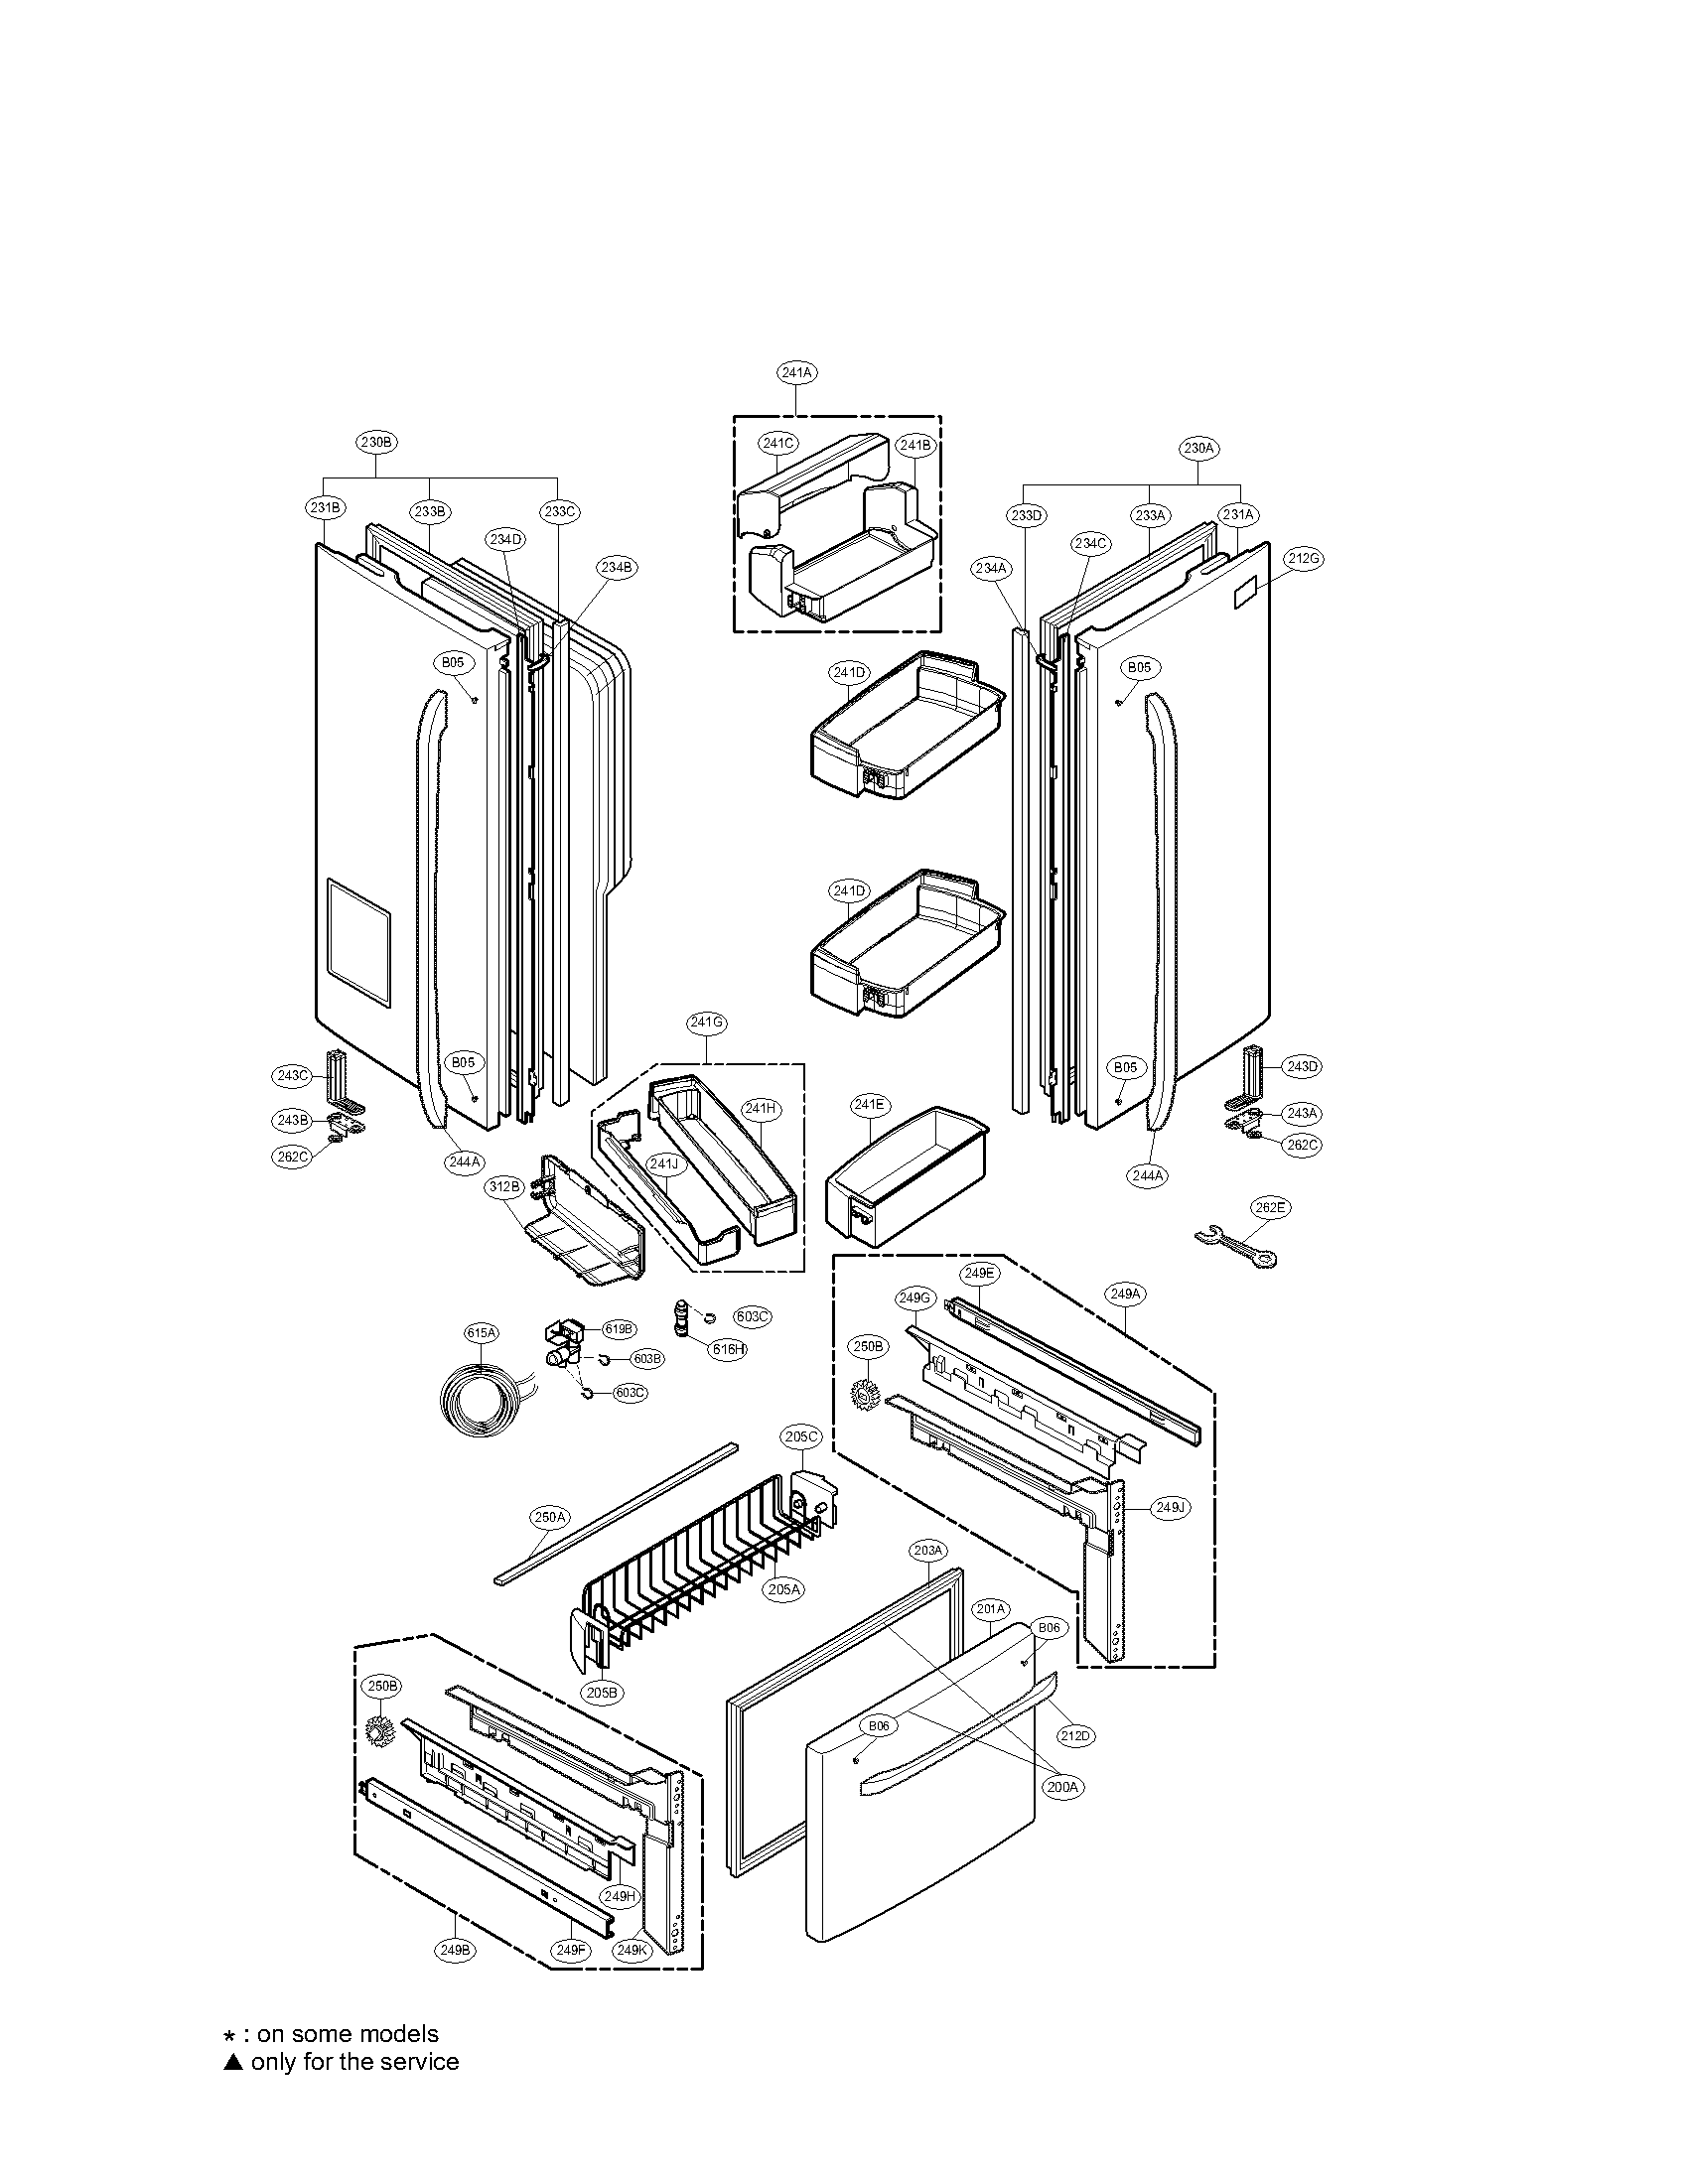 DOOR PARTS Diagram & Parts List for Model LFX25975SW LG